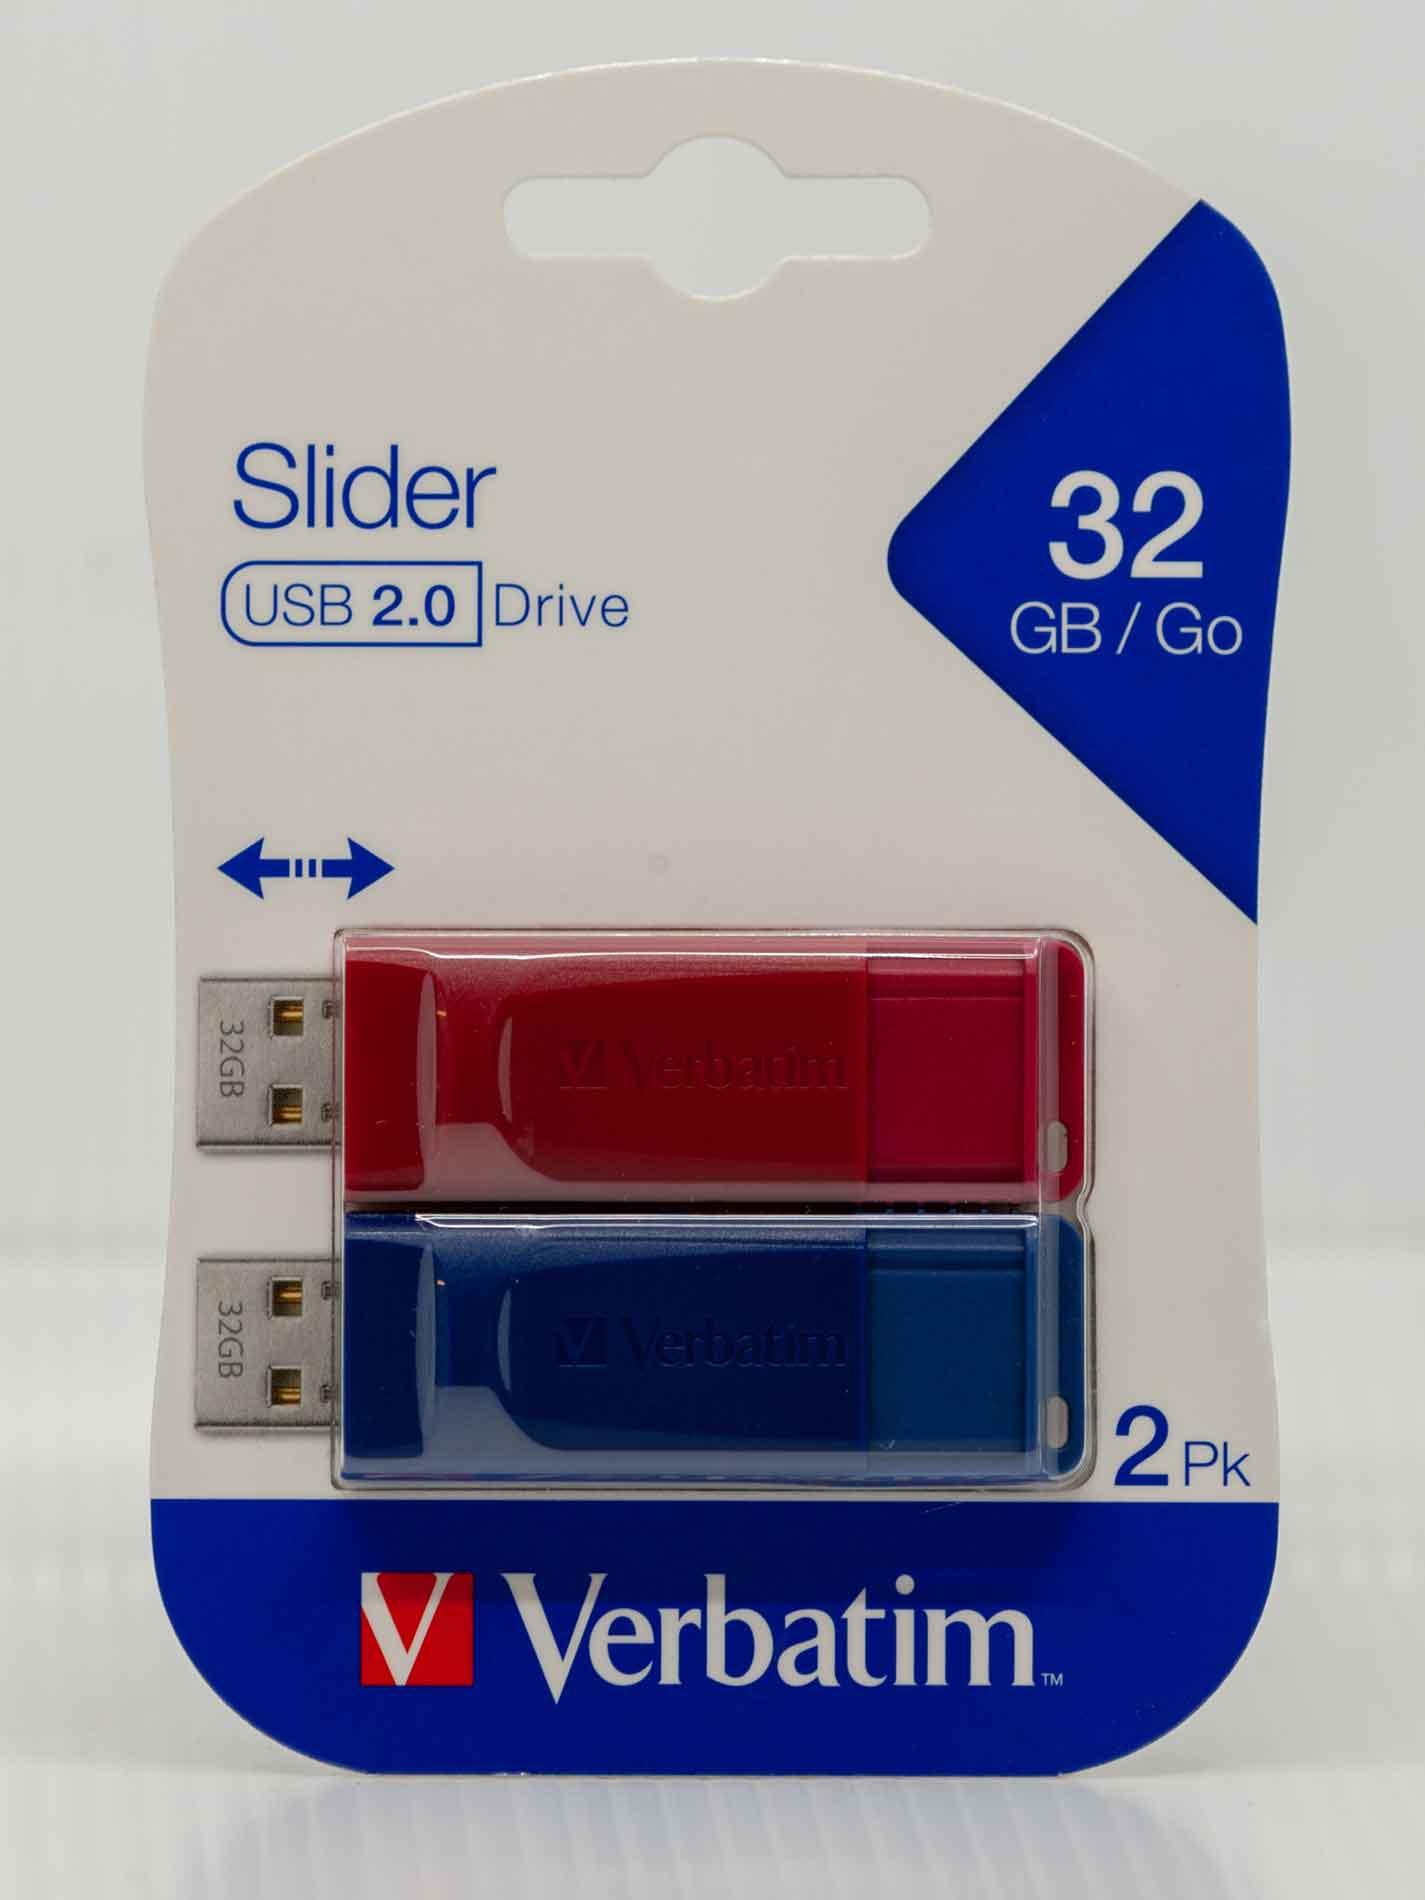 Verbatim Slider USB2.0 32GB  Twin Pack Flash Drives Image